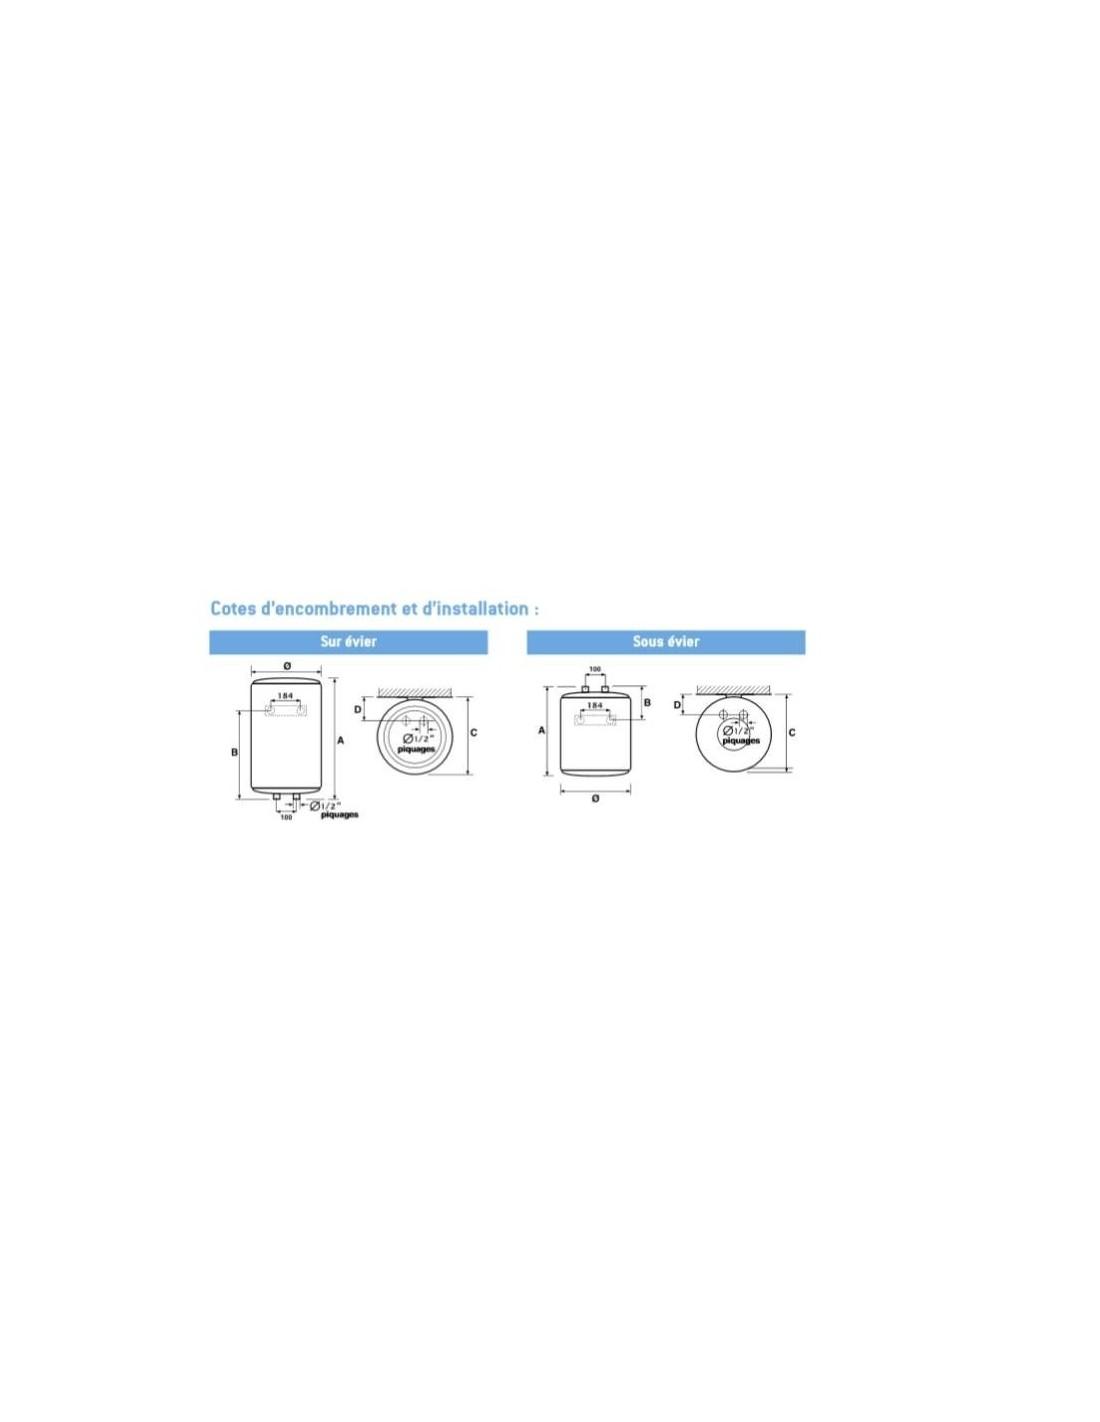 brico-travo.com/5551-thickbox_default/chauffe-eau-sur-evier-15-litres-thermor